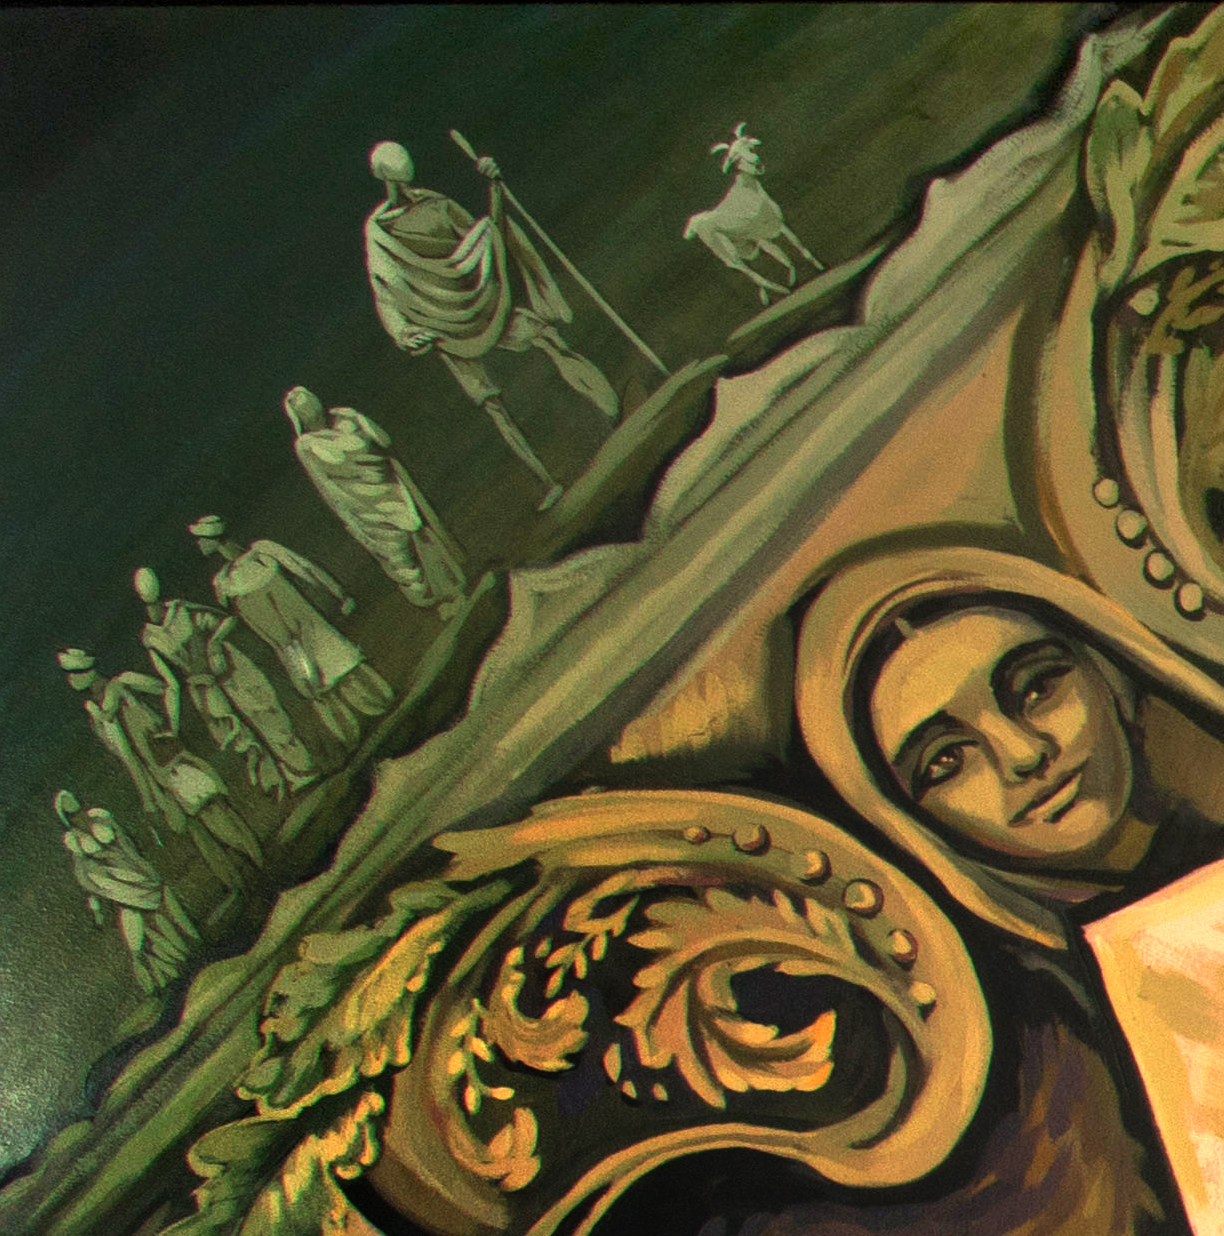 Gandhi Mural Cropped Professional Detail 03.jpg